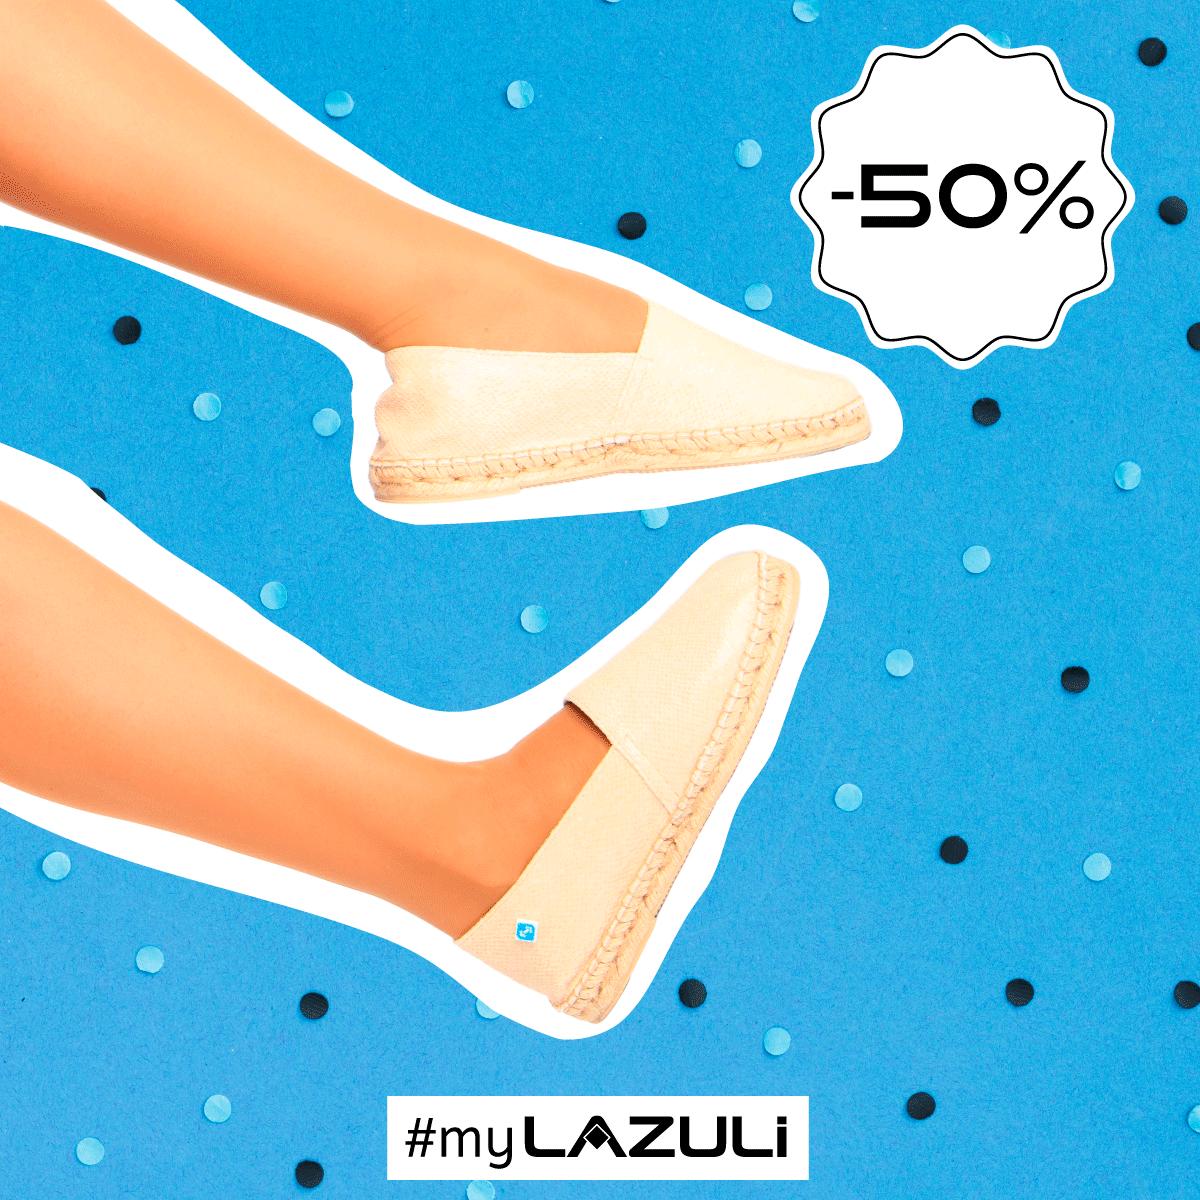 🚨  ÚLTIMOS SALDOS - 50% 🚨 #myLAZULI   #sale #saldos #descontos #shoponline #shopping #shoponline #SpringSummer #SS20 #ss2020 #PrimaveraVerao2020 #espadrilles #alpargatas #Footwear #PortugueseShoes #PortugueseInspiration #PortugueseTiles  #Lazuli #LazuliShoes https://t.co/o5FGXC6ym5